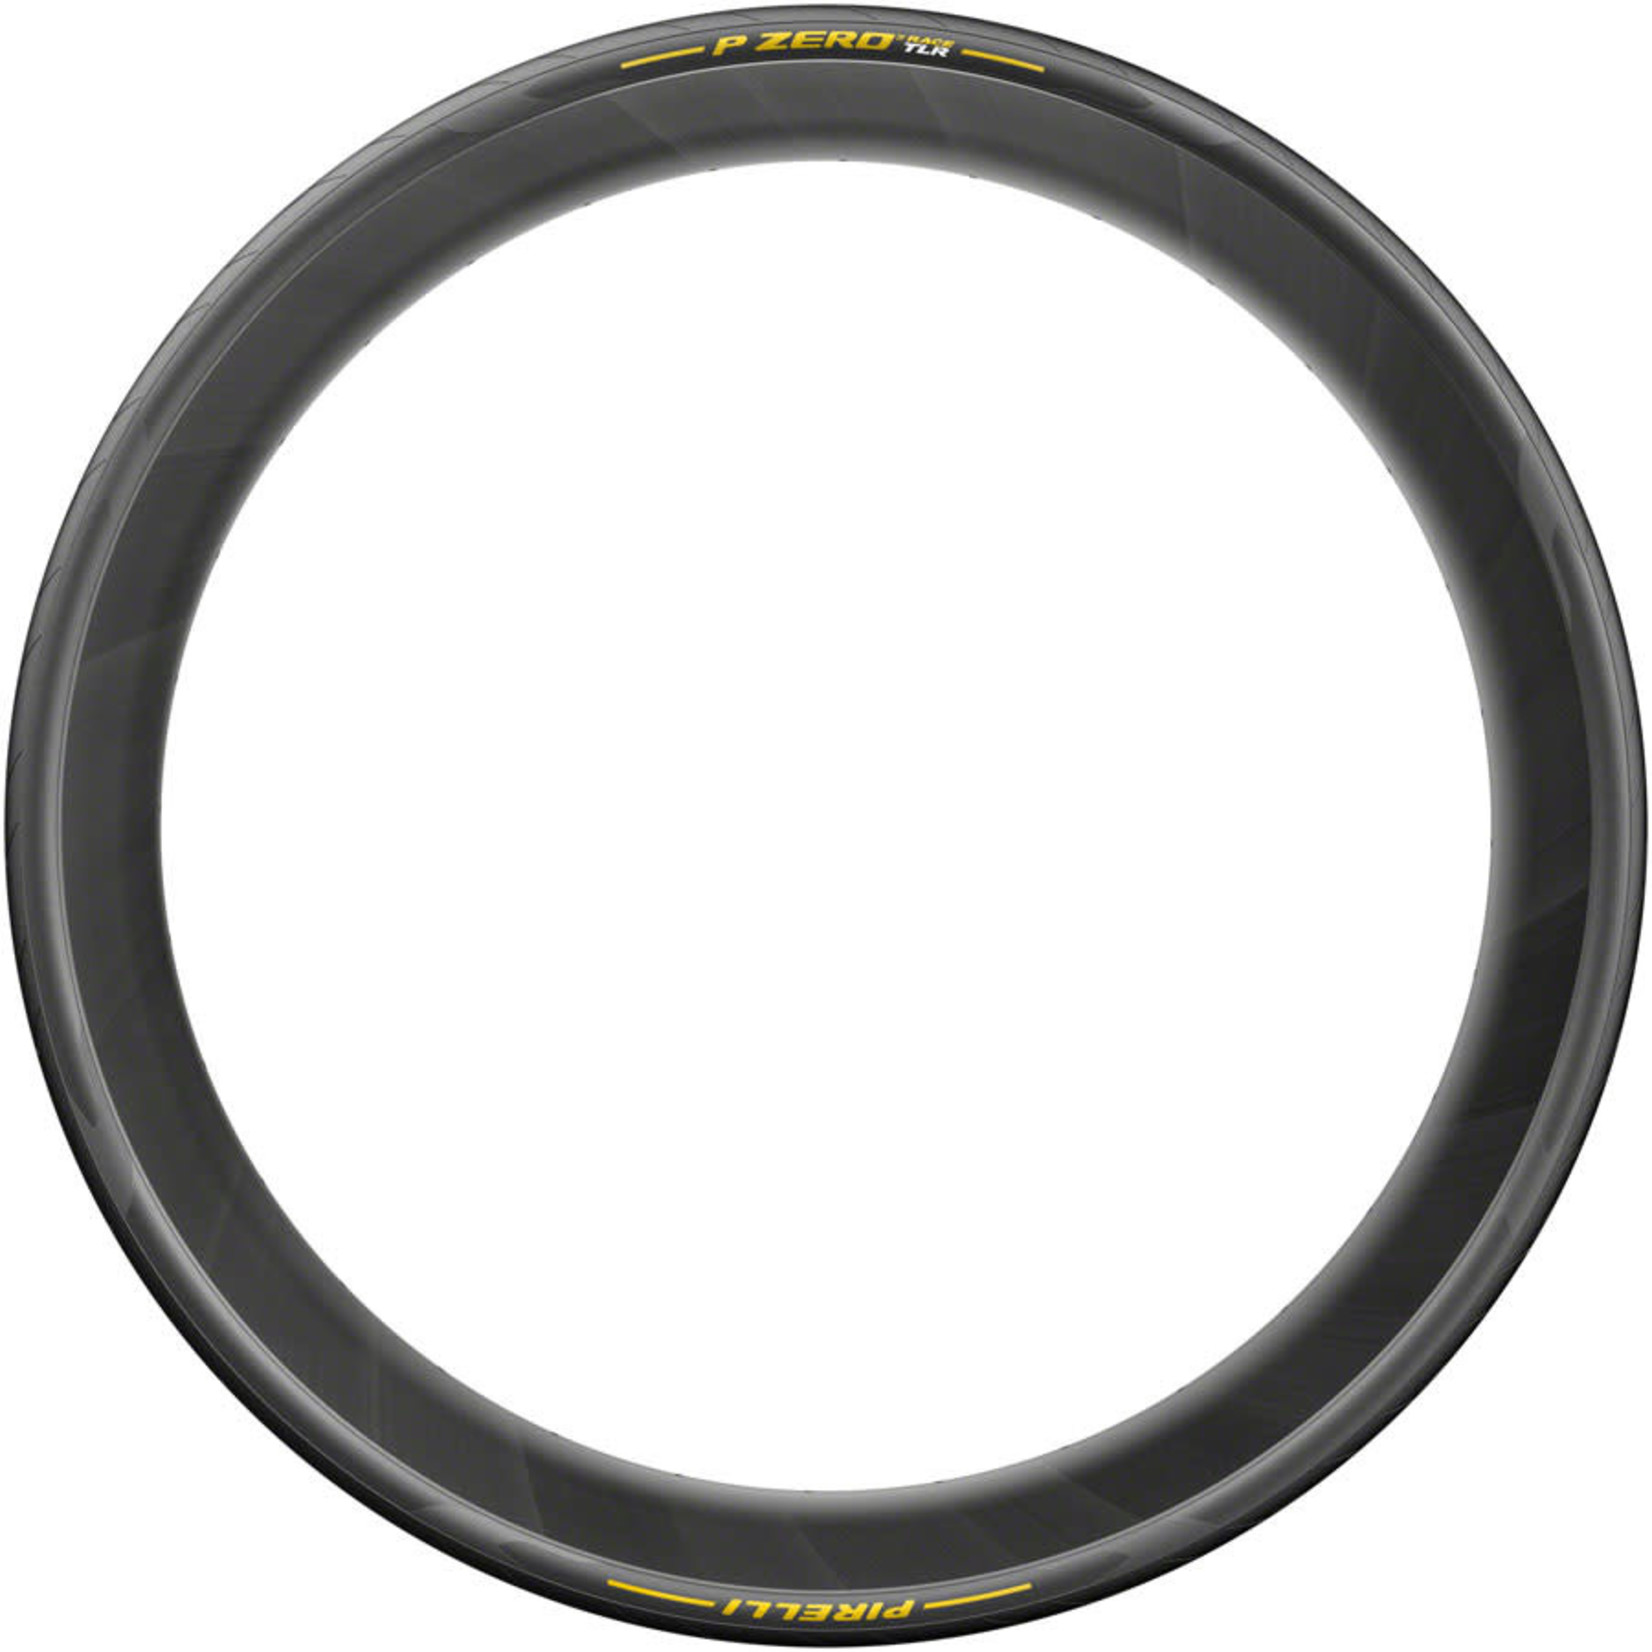 Pirelli Tire LLC Pirelli P ZERO Race TLR Tire - 700 x 26, Tubeless, Folding, Yellow Label